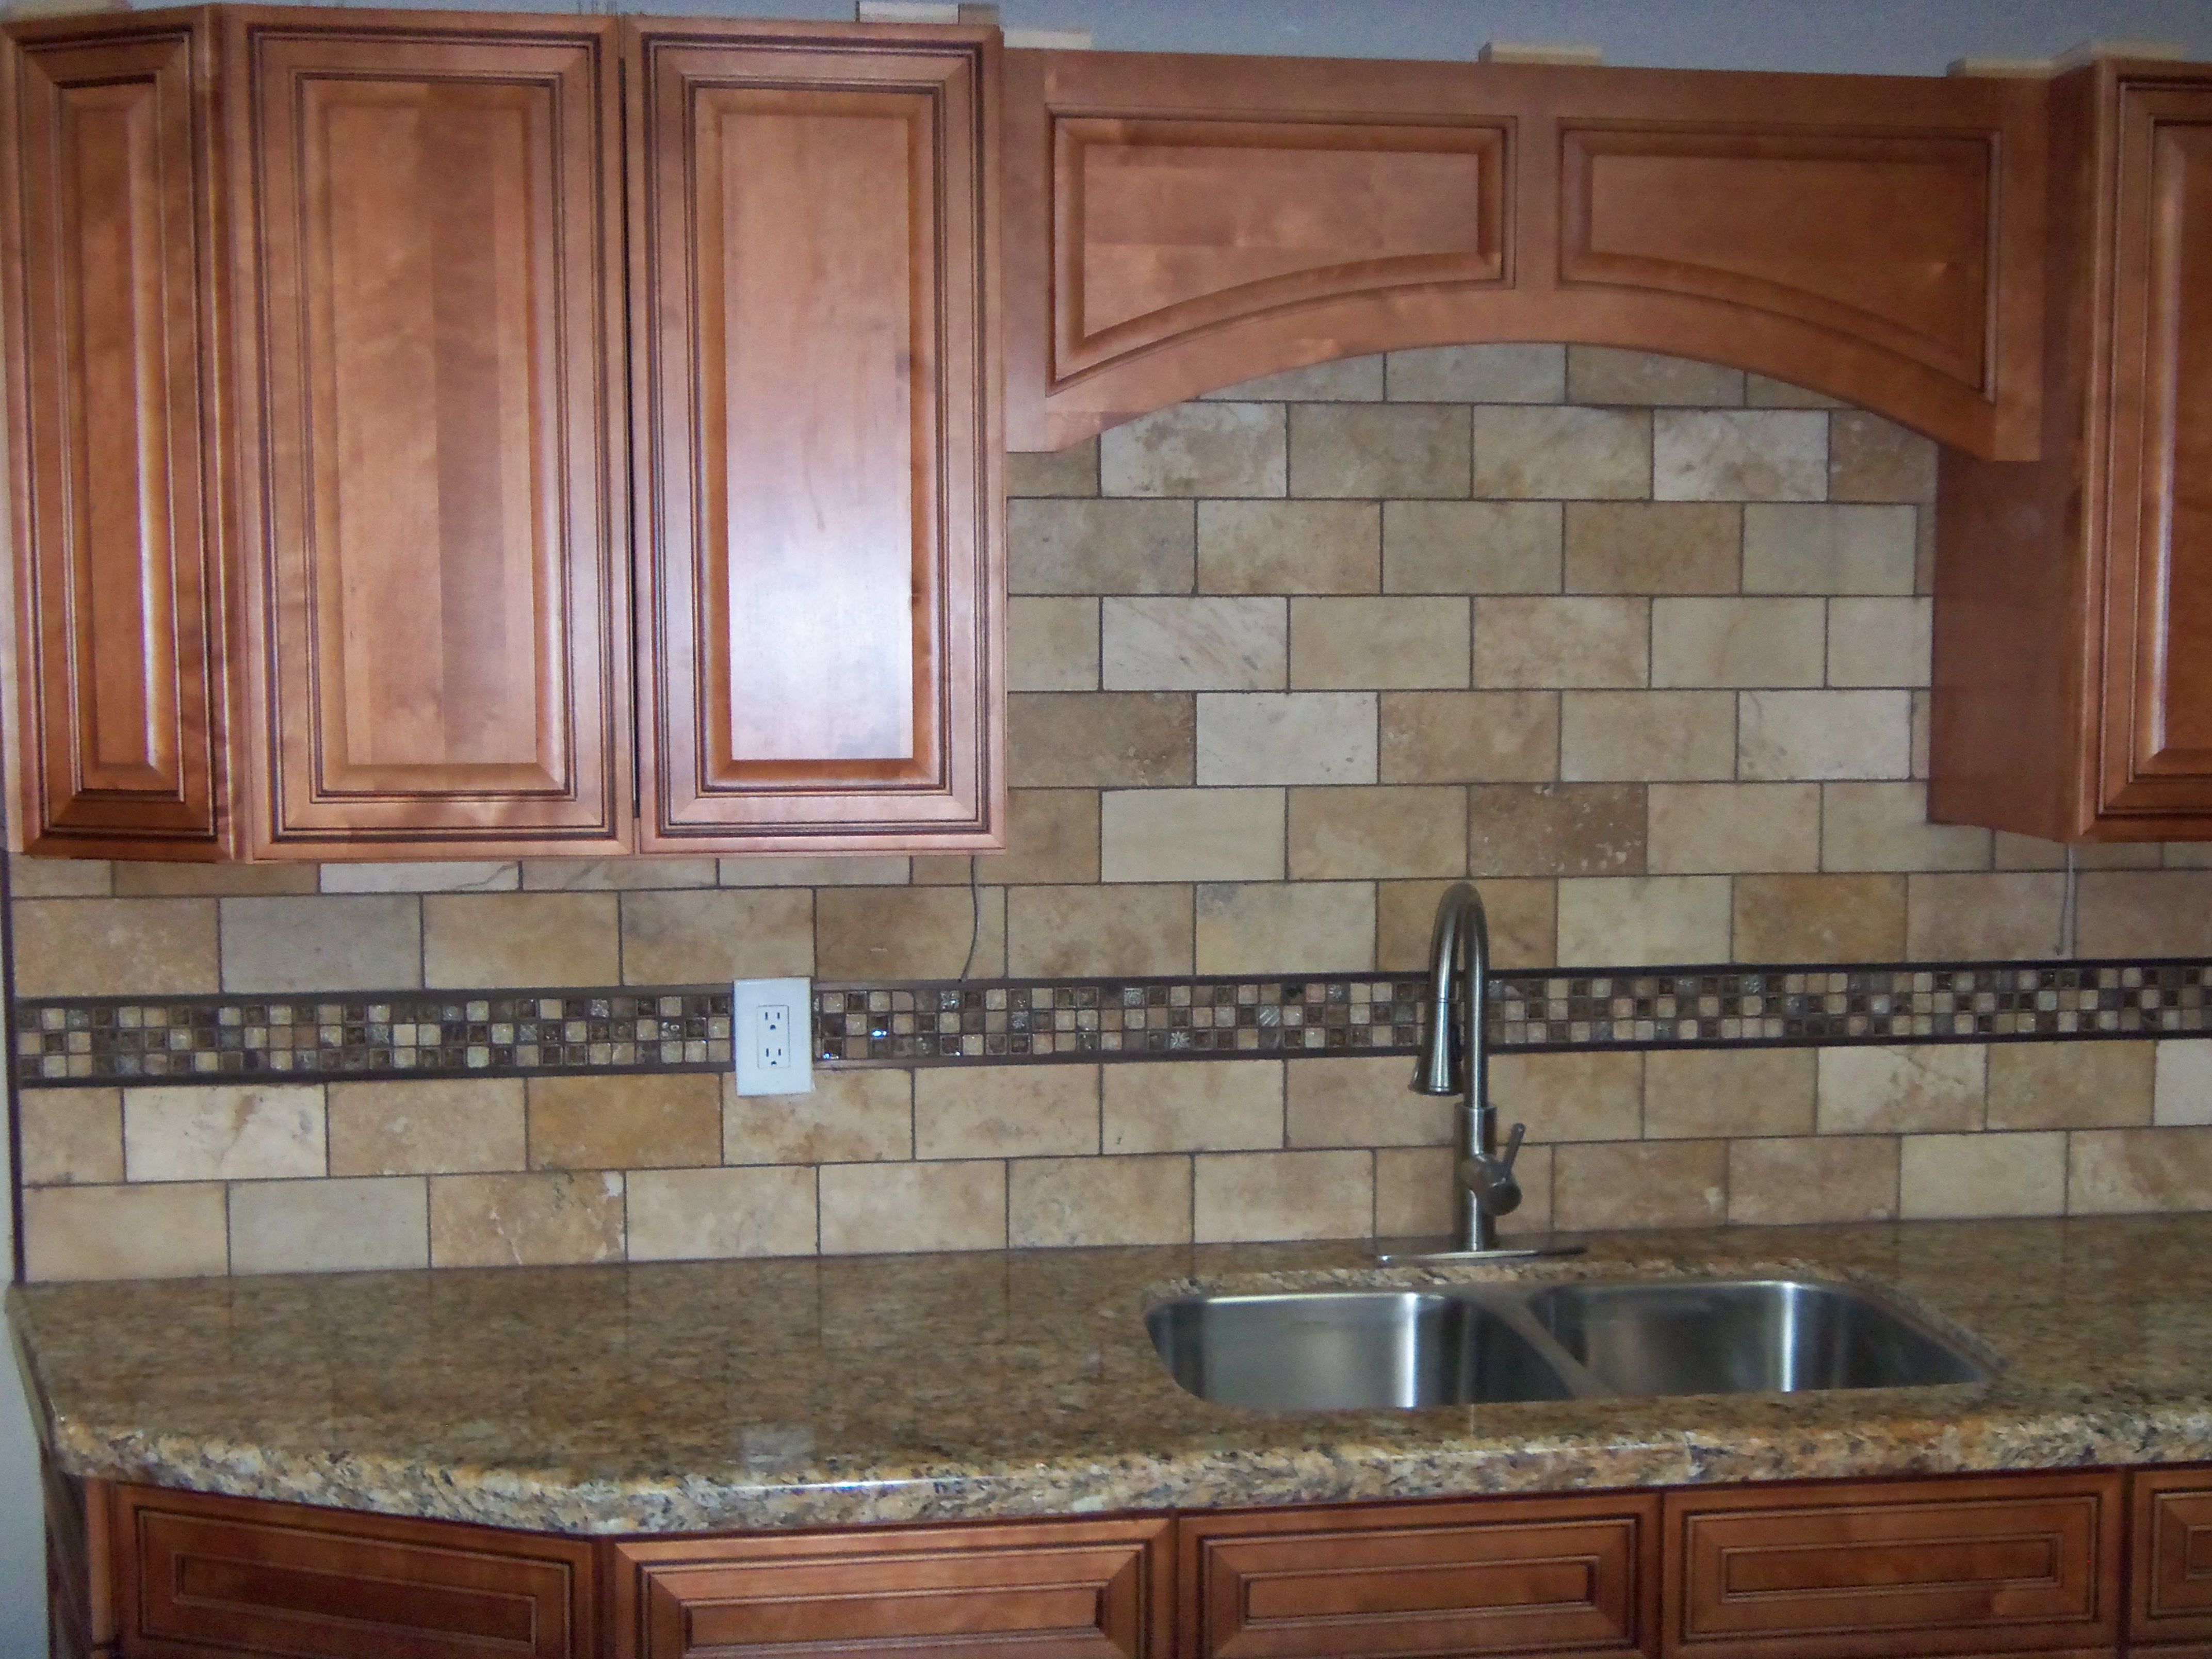 glendale az phx area kitchen cabinets & remodeling showroom